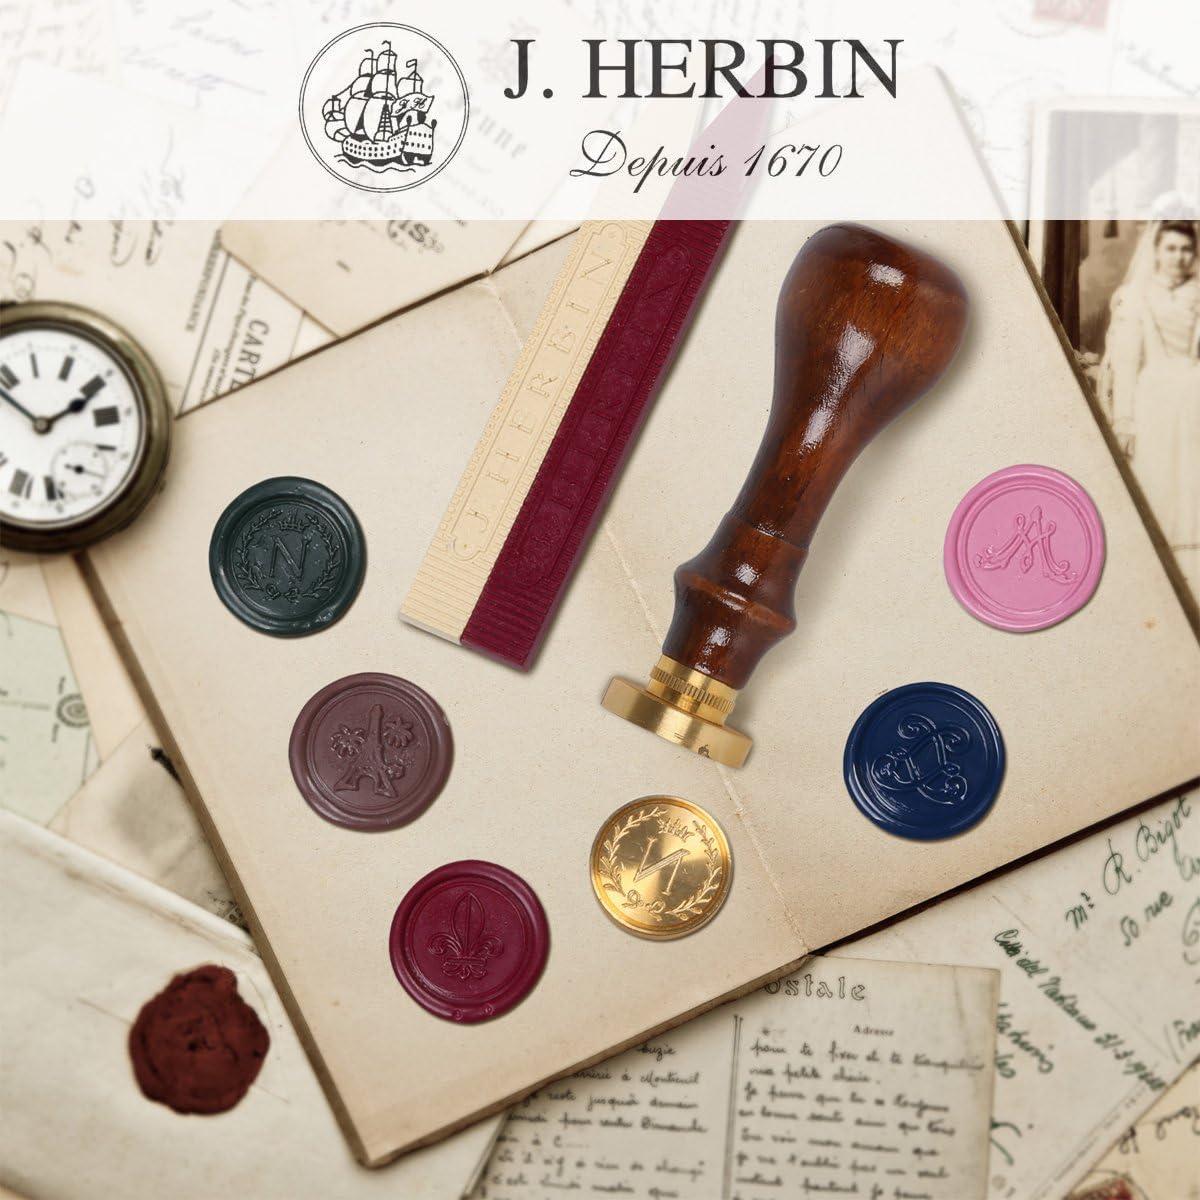 Herbin 46001T Strumenti per Ceralacca 18 x 7 x 1.6 cm